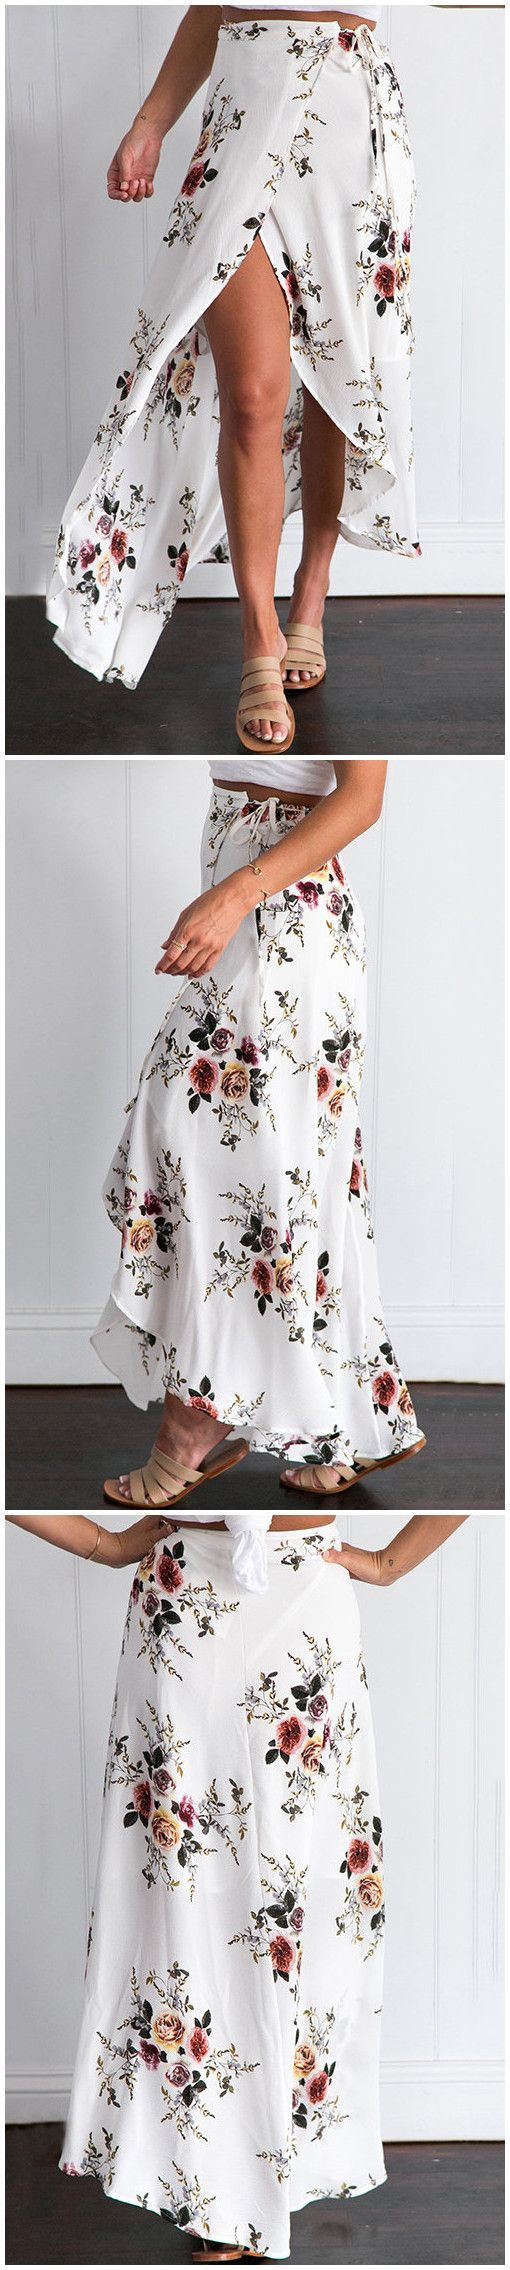 White Random Floral Print Splited Hem Self-tie Maxi Skirt